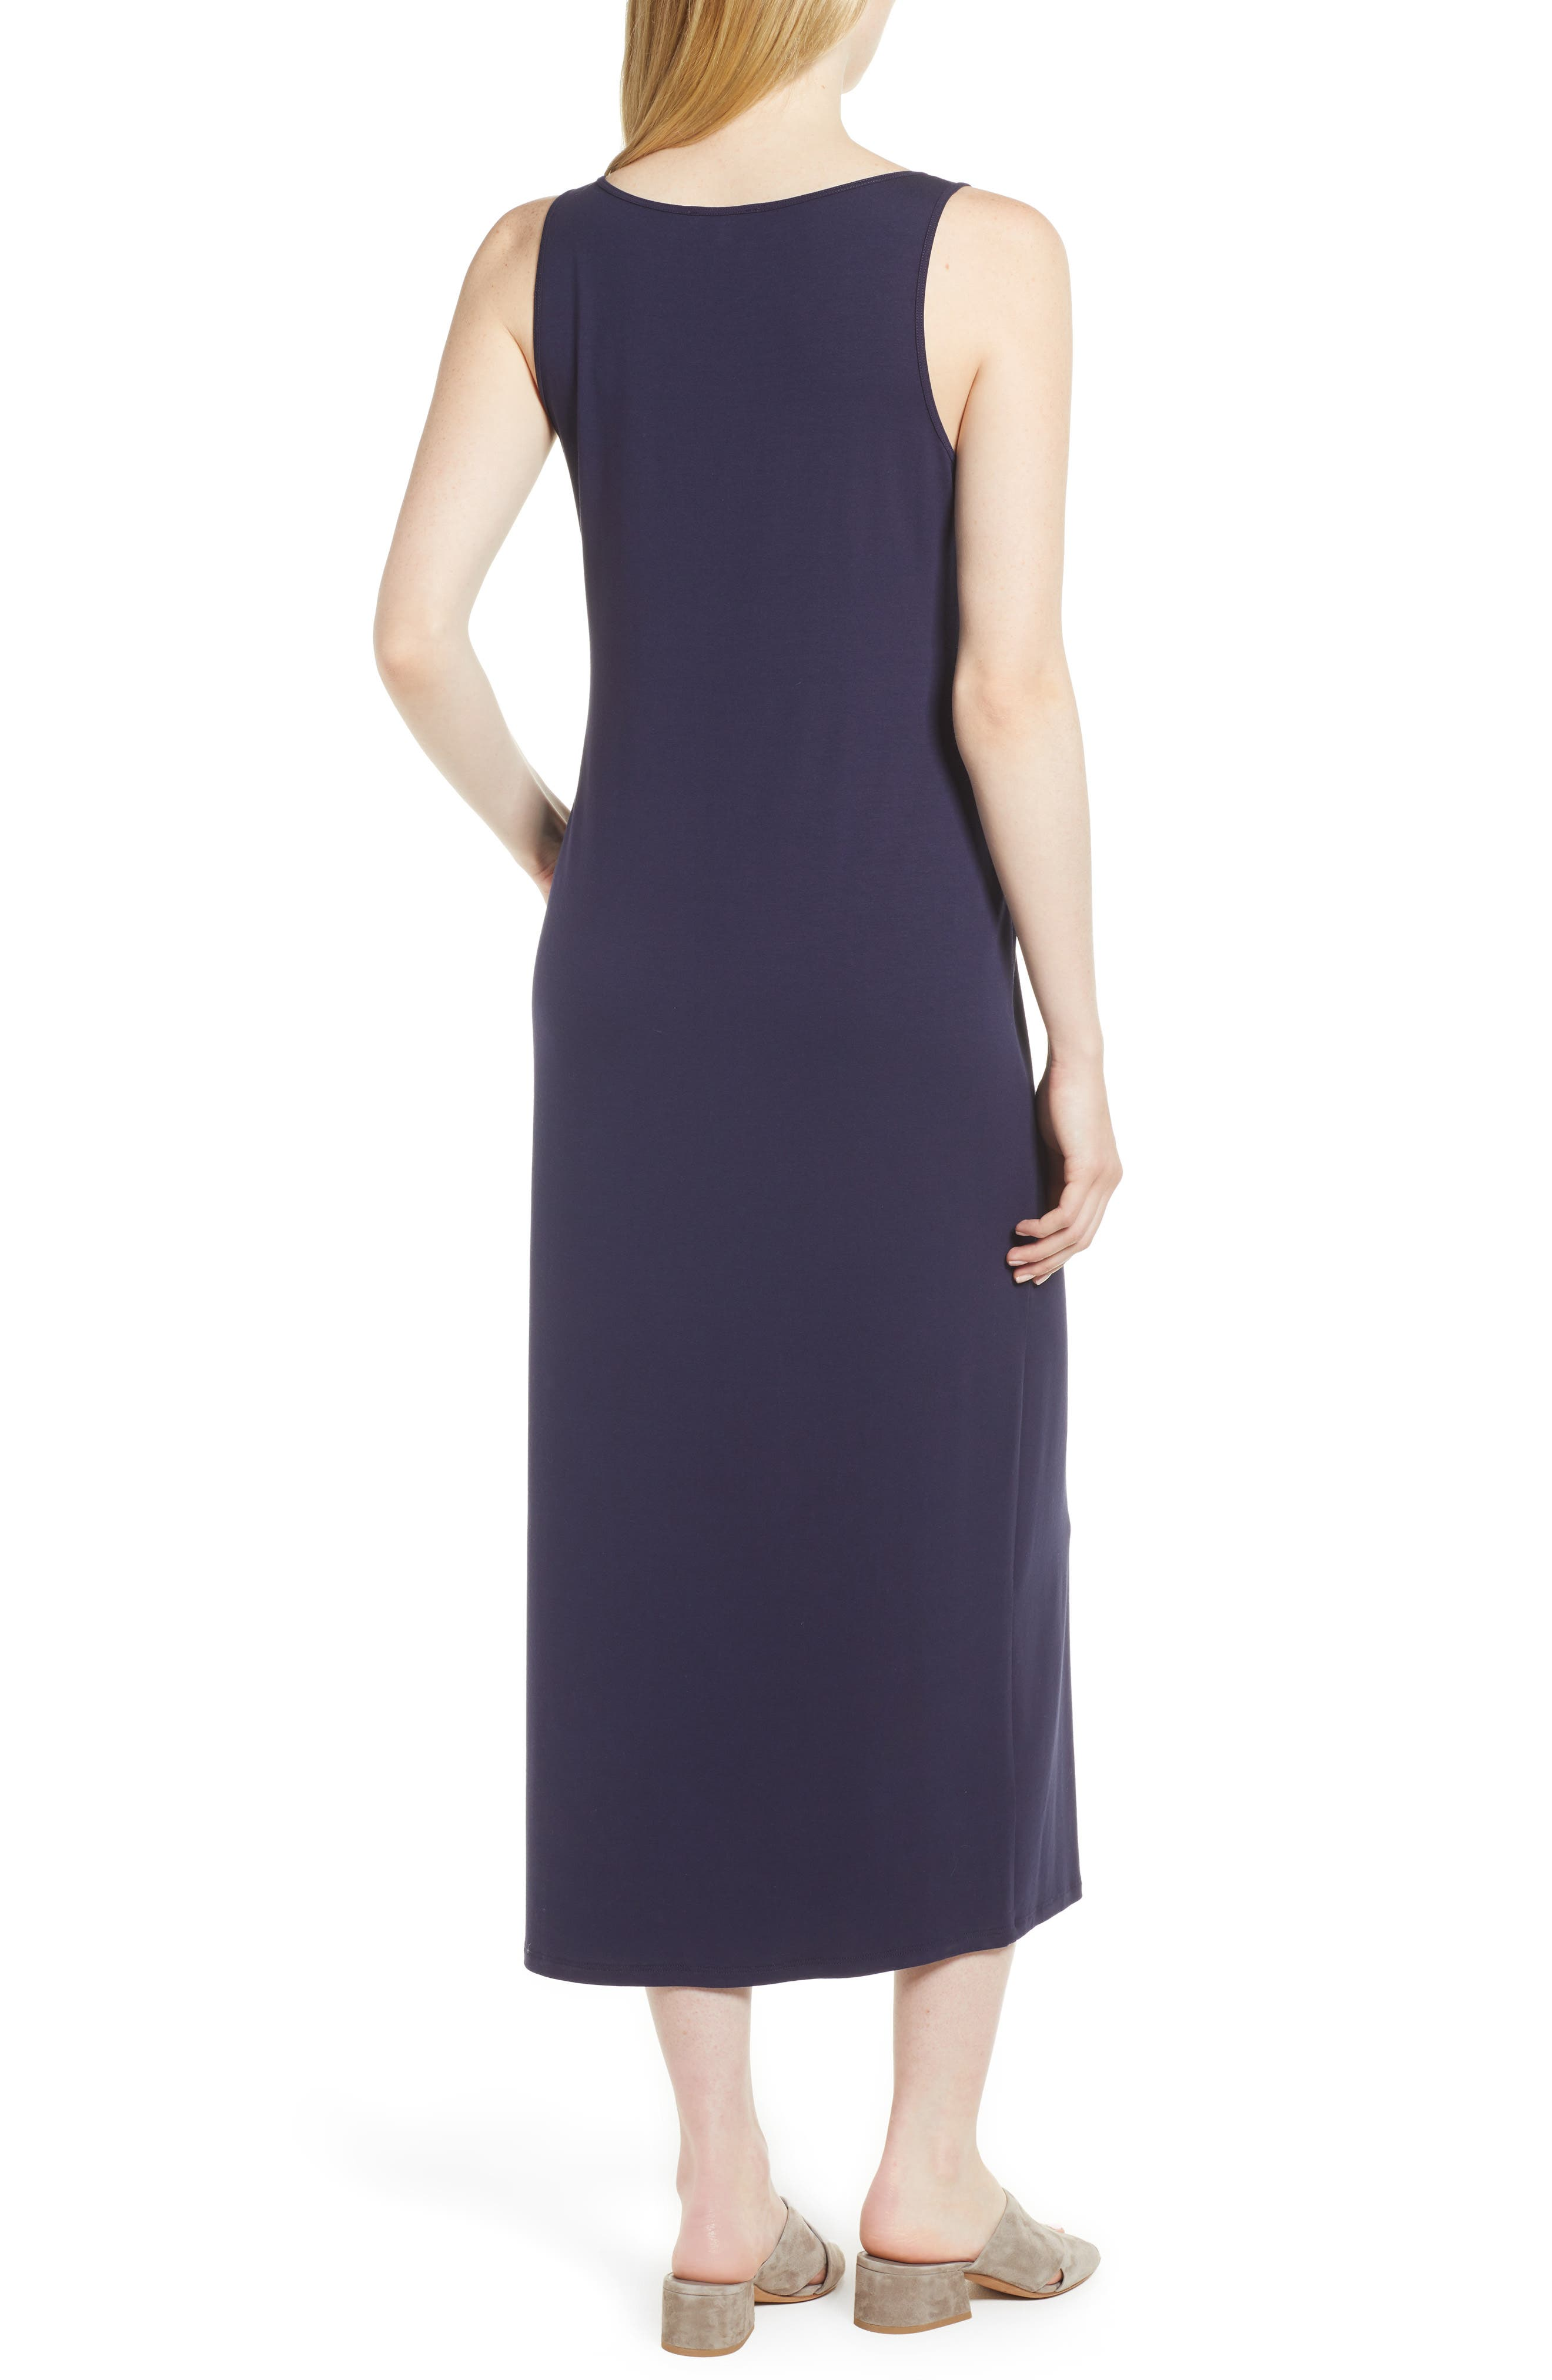 Midi Tank Dress,                             Alternate thumbnail 2, color,                             MIDNIGHT